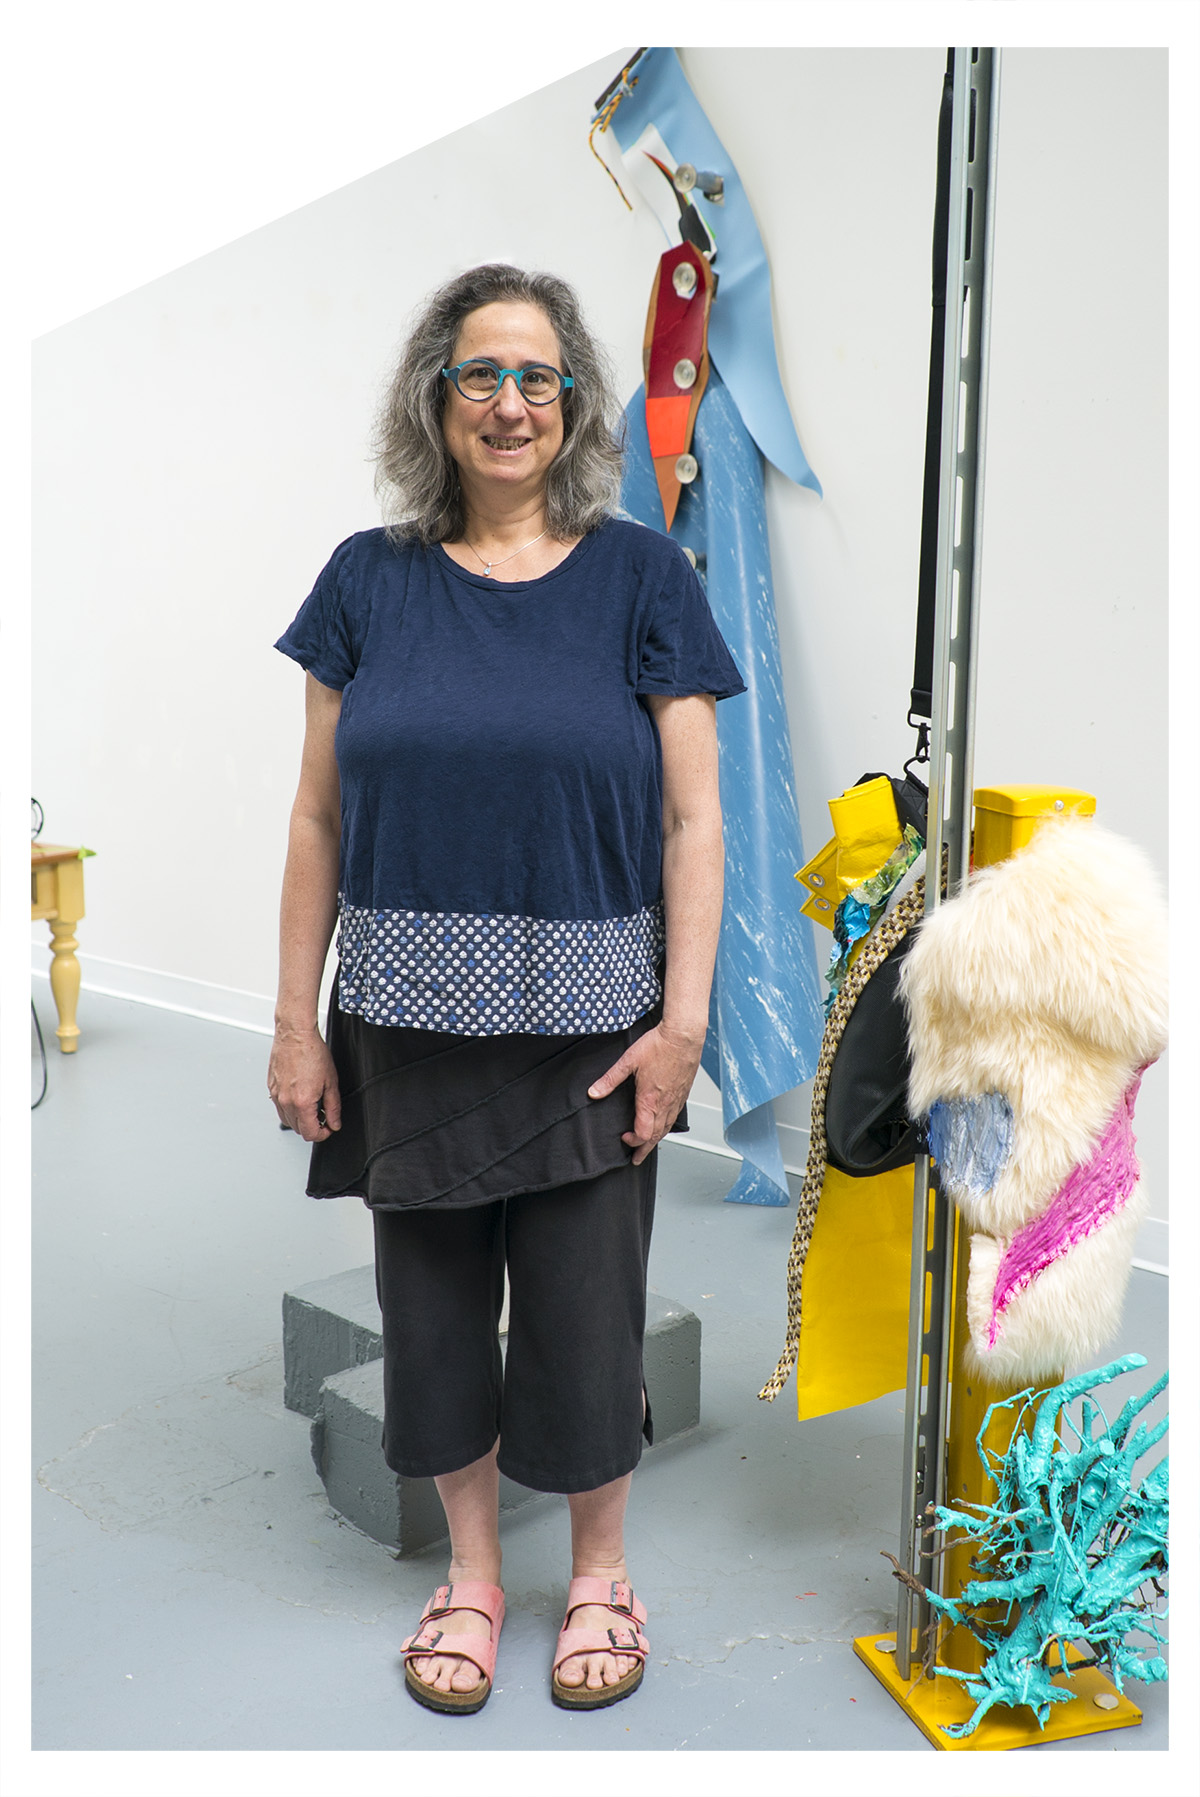 Jessica Stockholder in her studio at University of Chicago.